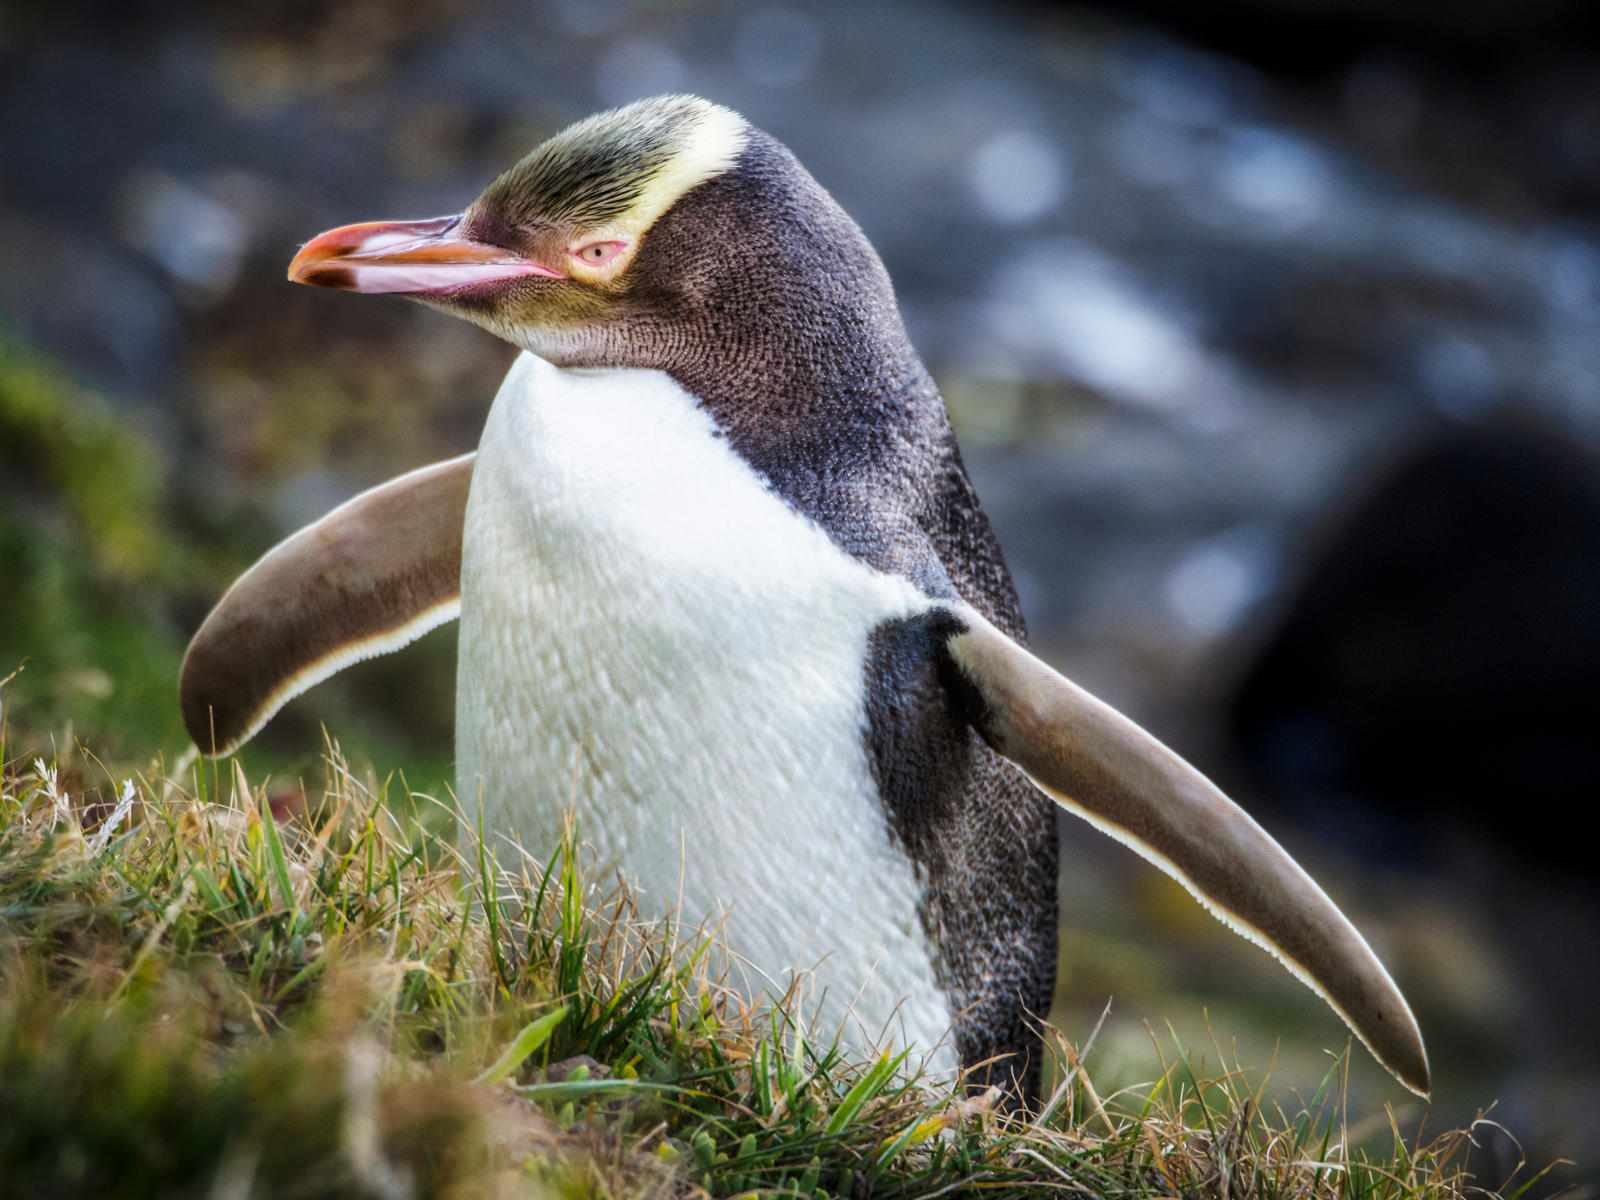 http://fc03.deviantart.net/fs71/i/2014/041/9/4/yellow_eyed_penguin_by_wolfblueeyes-d75xd14.jpg